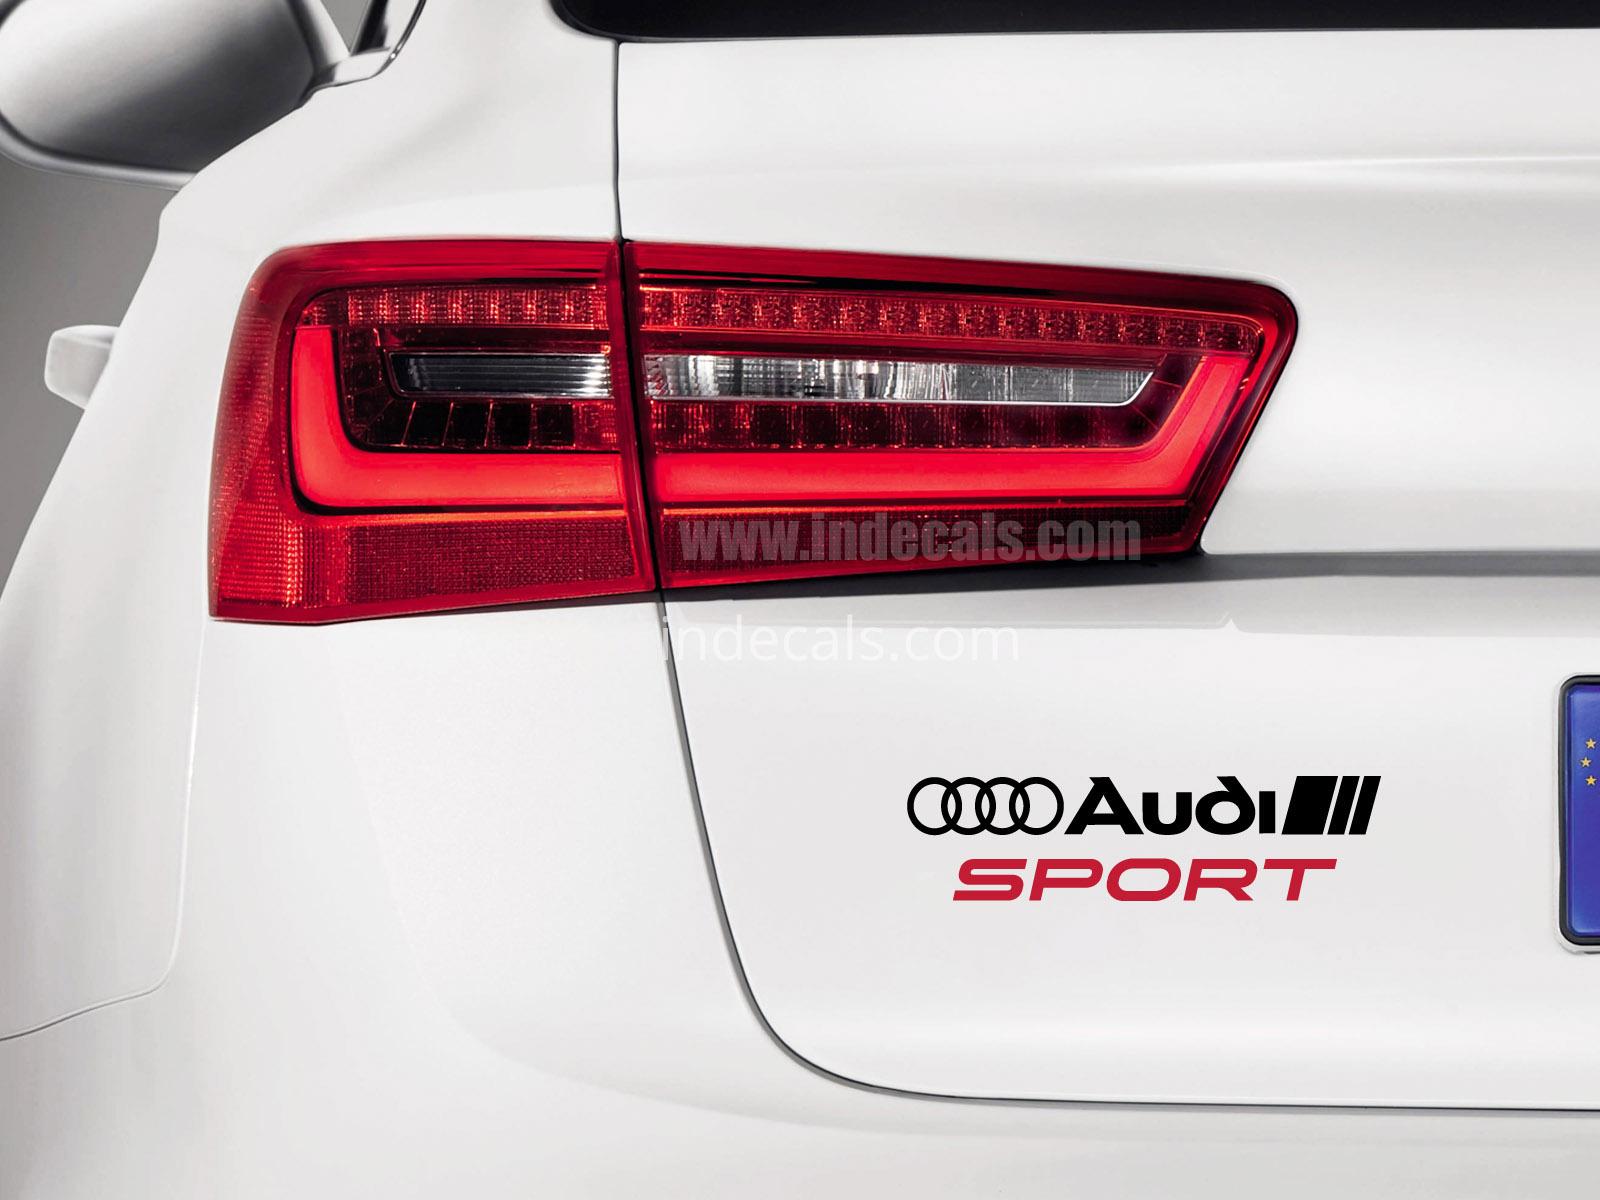 Black Audi Stickers Decals Indecals Com